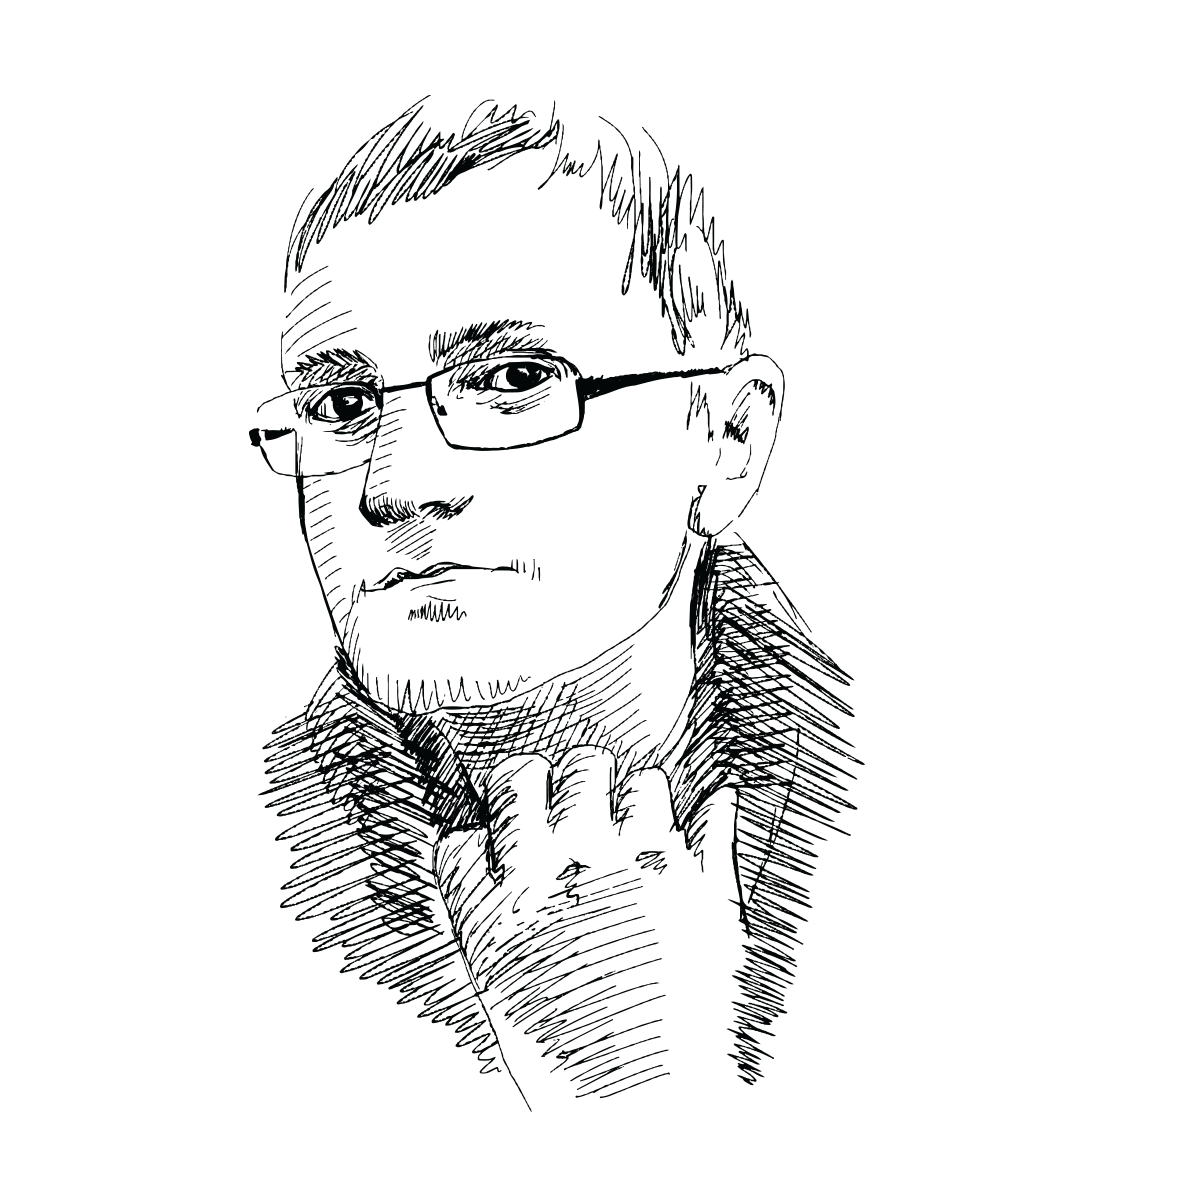 https://www.archiverde.it/wp-content/uploads/2017/05/minimalist-image-team-member-03-large.png